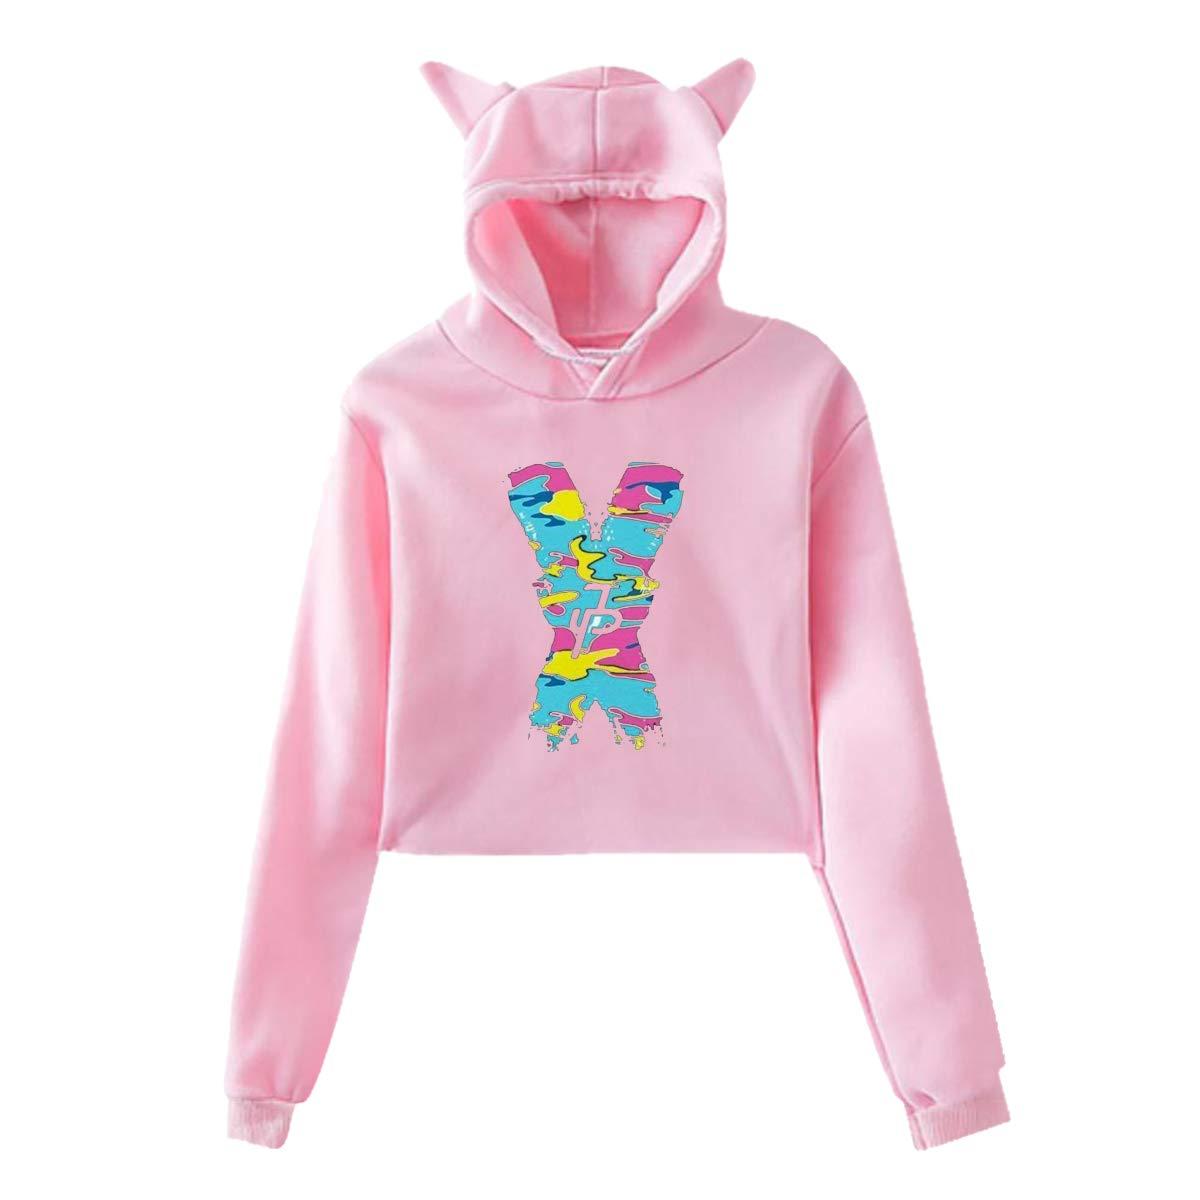 Womens Cat Ear Pullover Hoodie Jake Paul X JP Hooded Sweatshirt Hoodies for Women Girls Clothes Outdoor Sport Coat Tops Pink 29